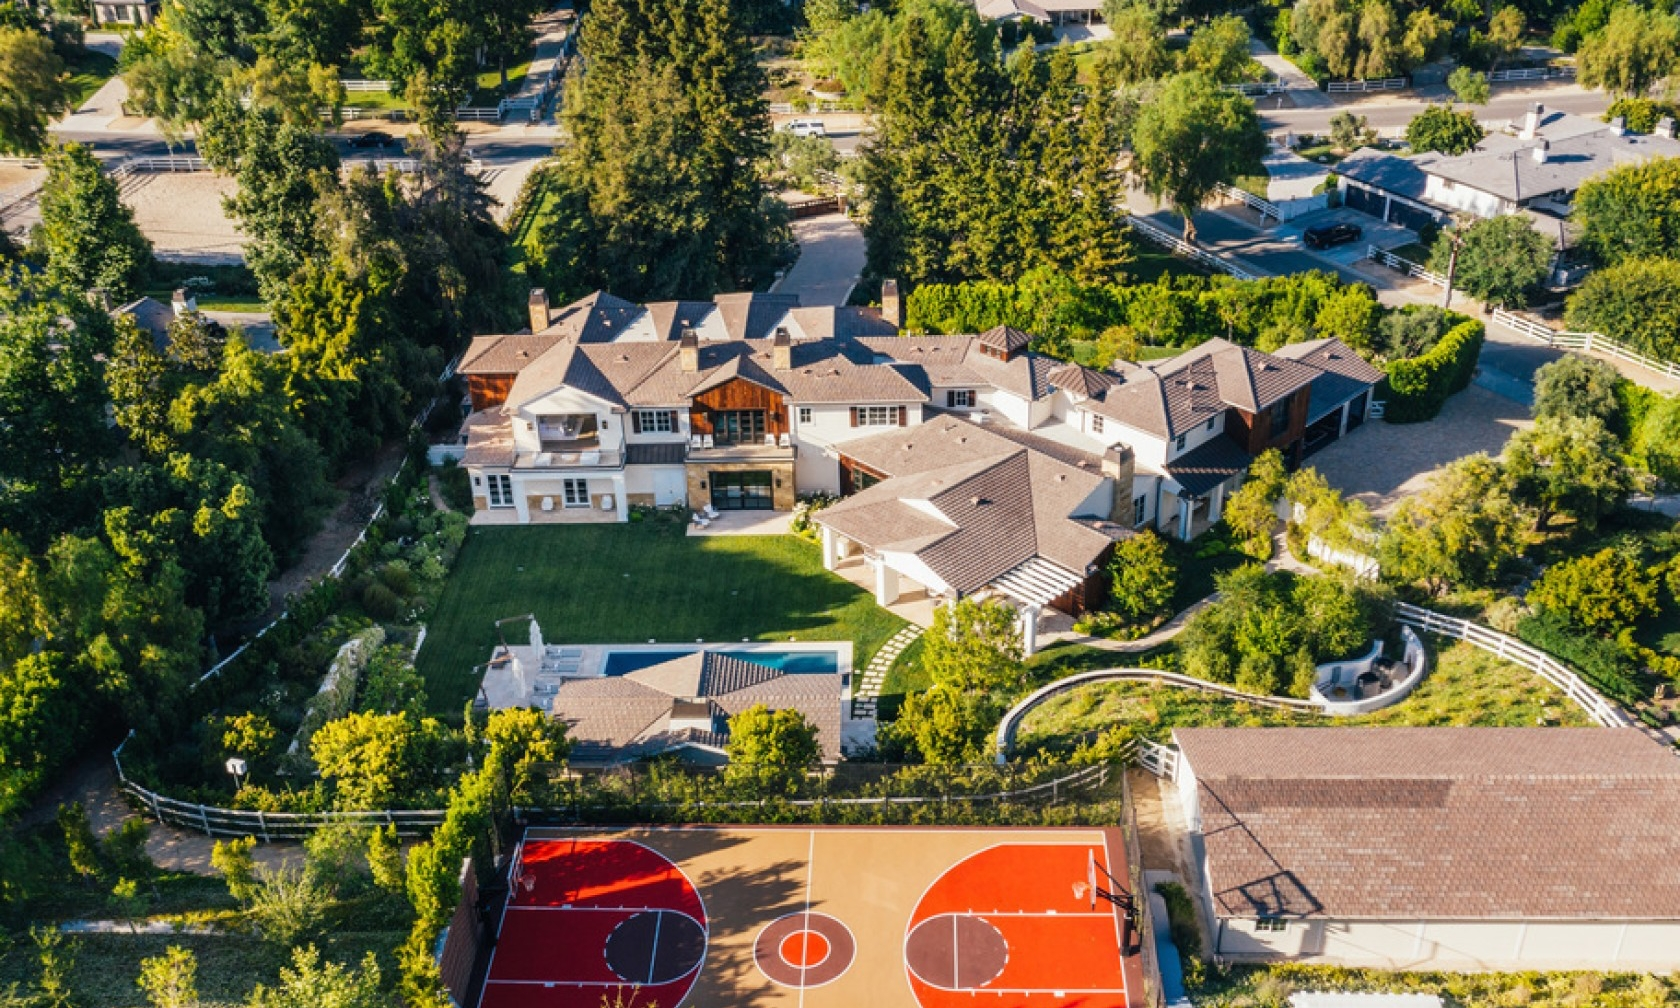 The Weeknd 挂牌出售 2,500 万美元豪宅